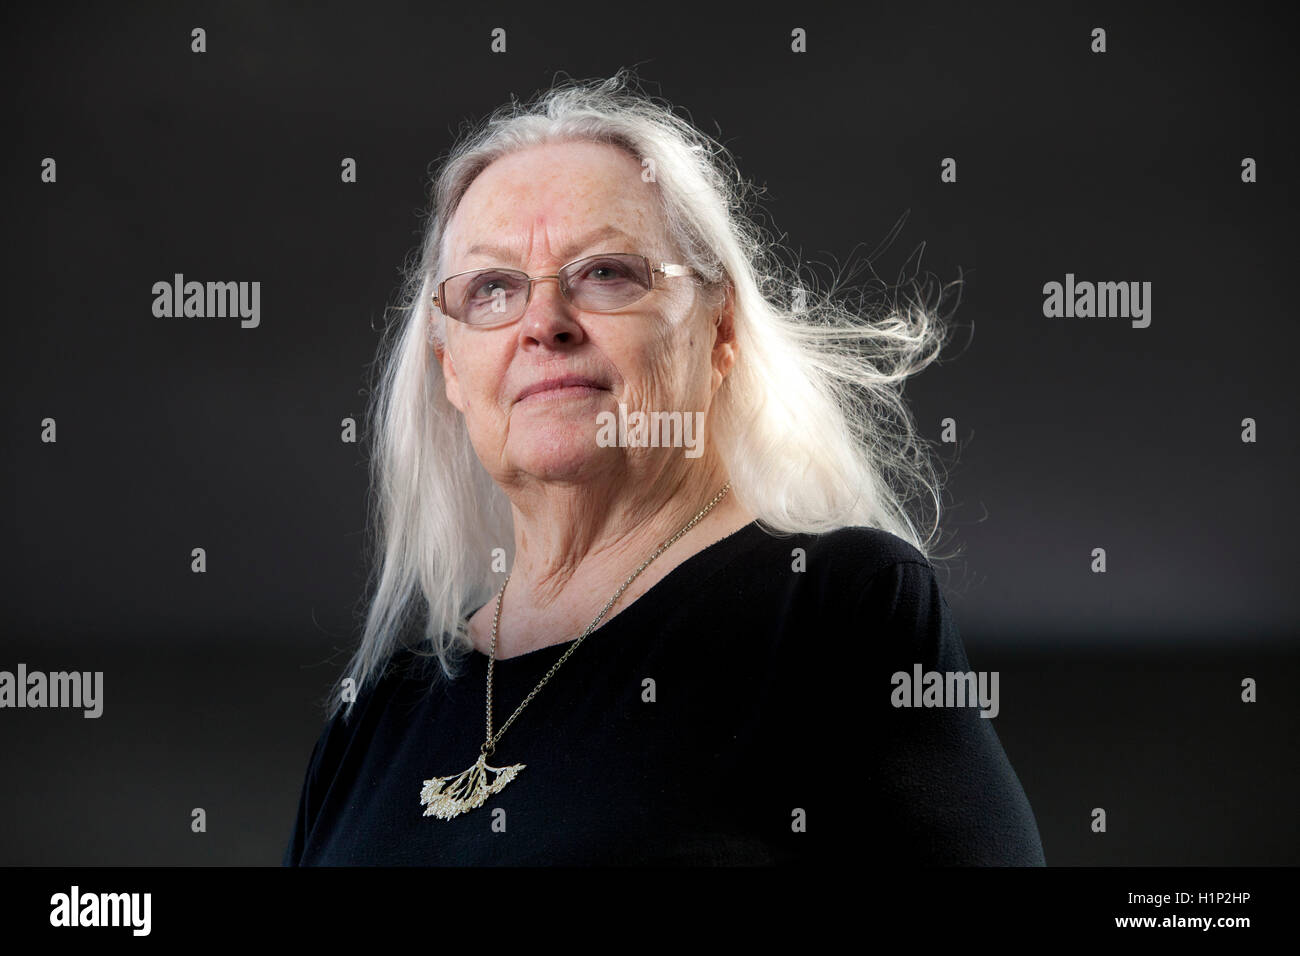 Gillian Clarke, the Welsh National poet and playwright, at the Edinburgh International Book Festival. Edinburgh, - Stock Image